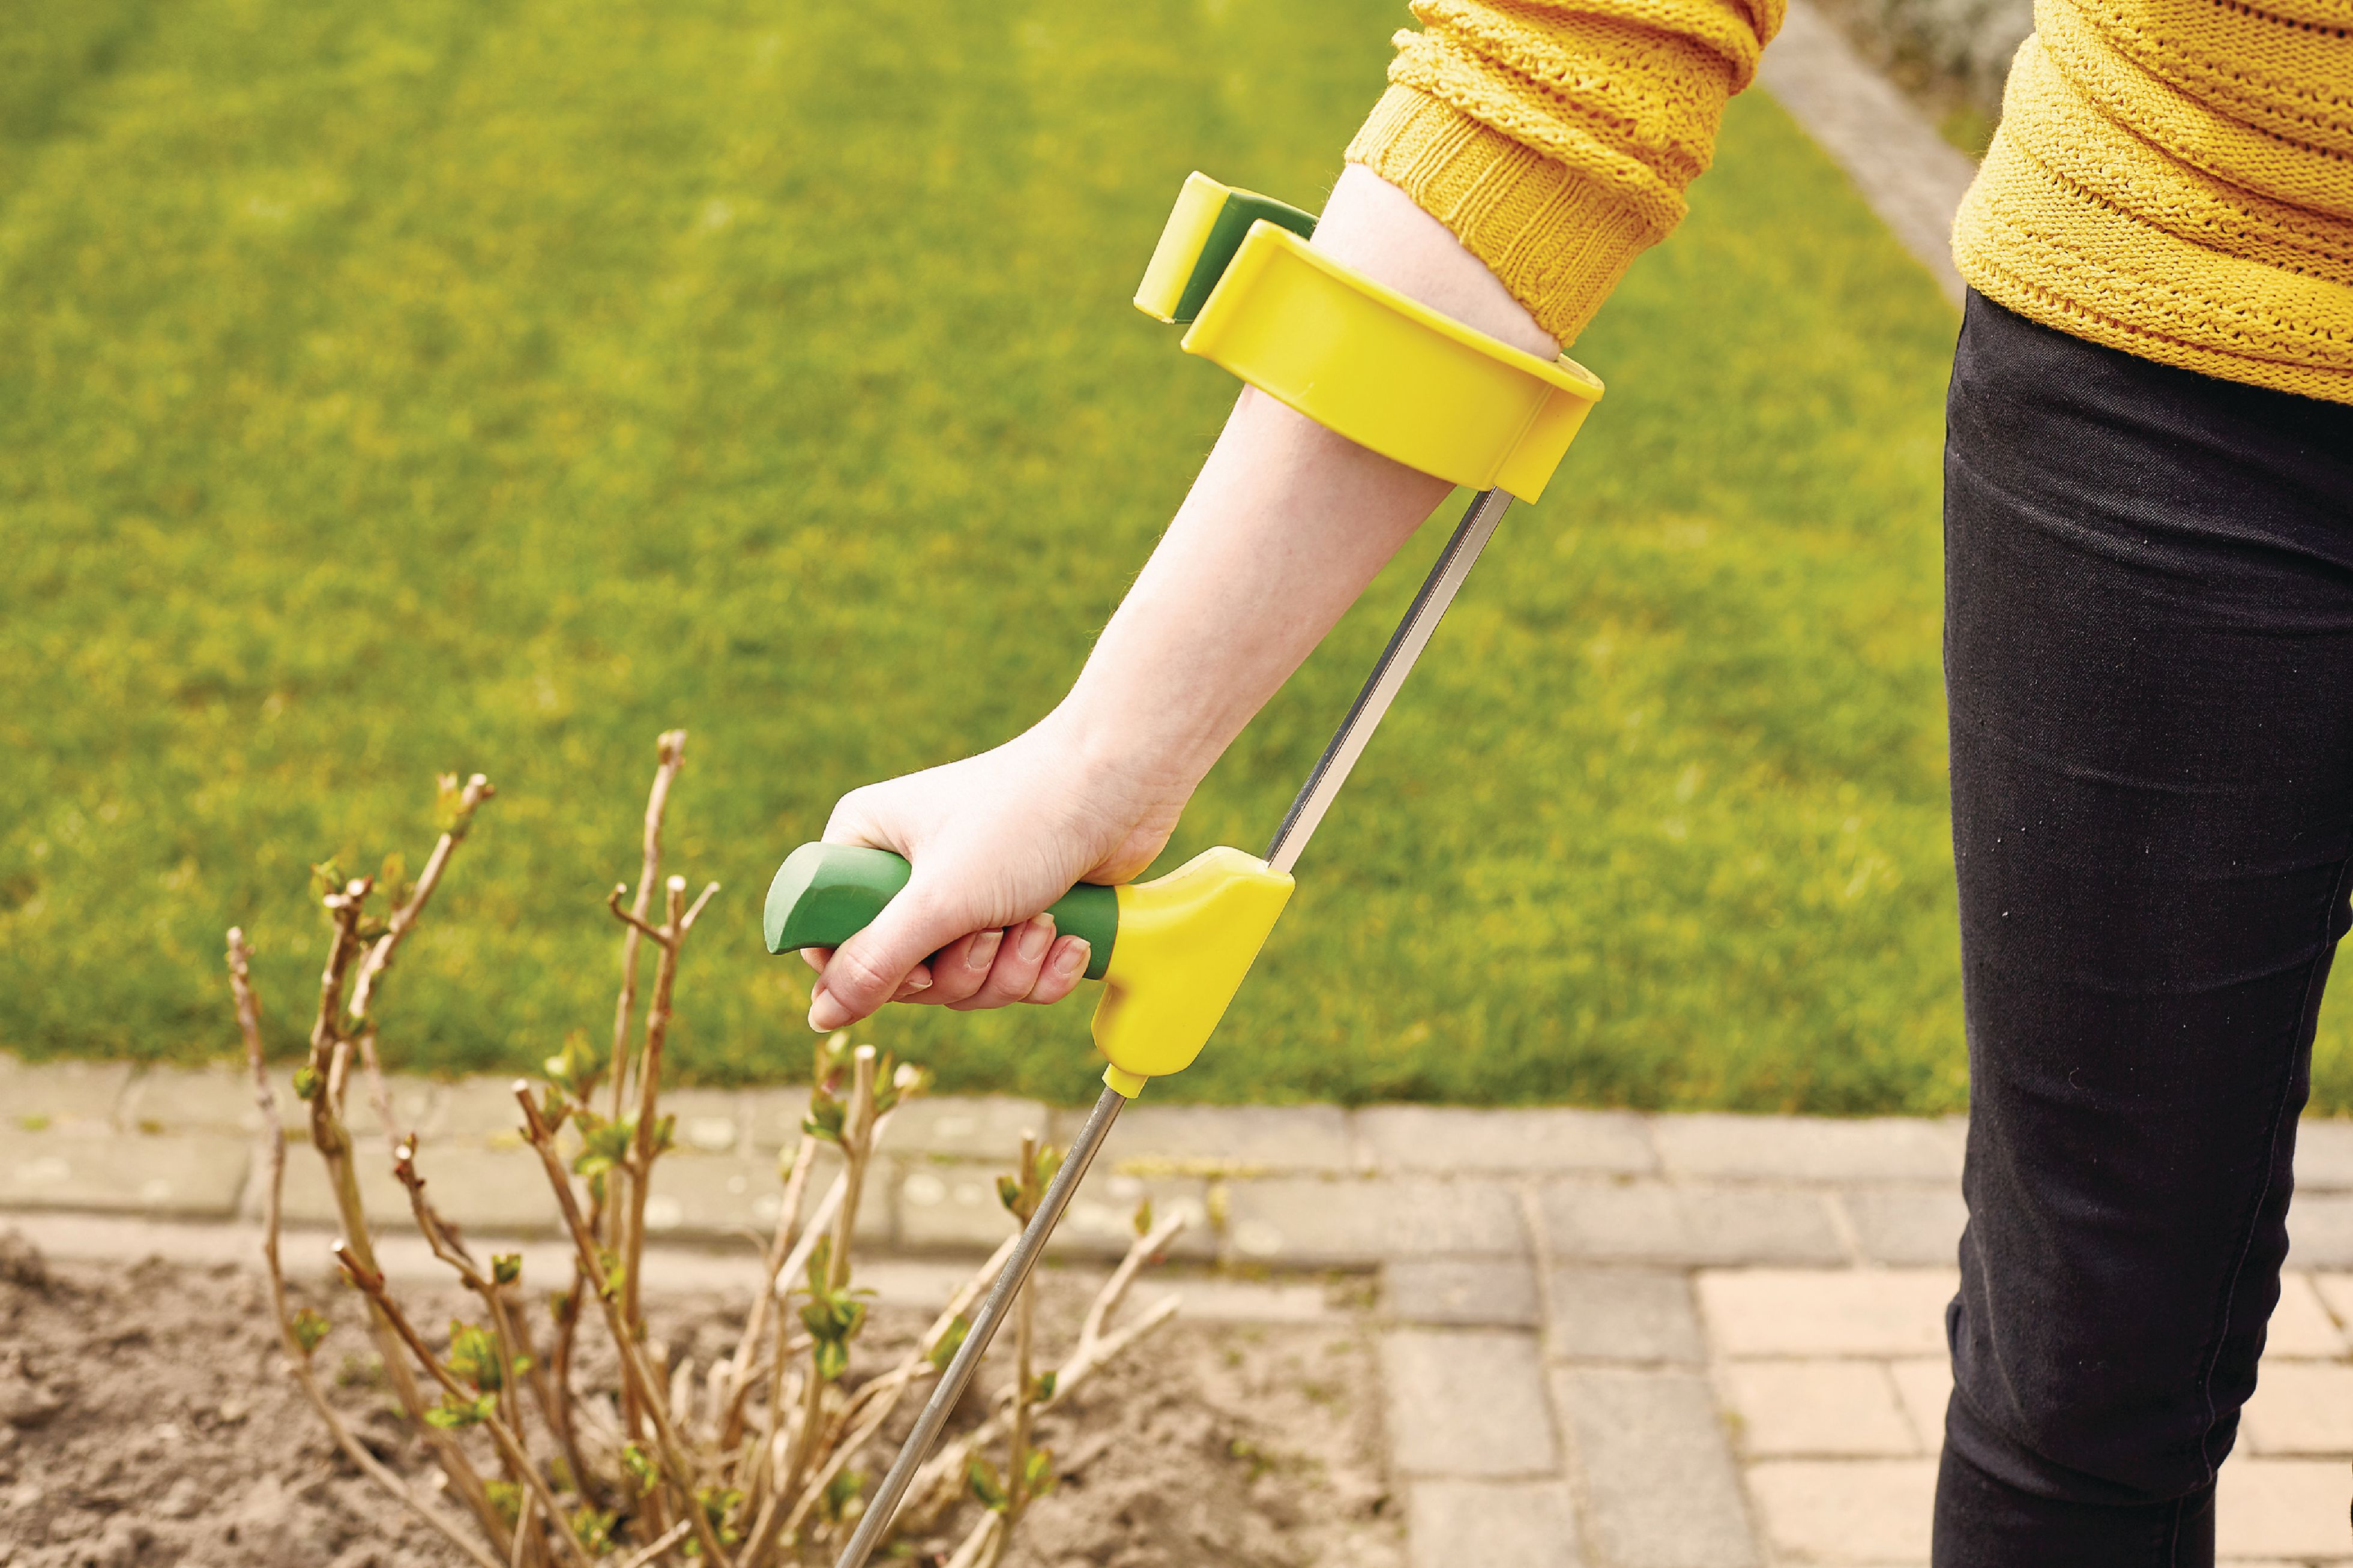 Vit 70410160 Vitility Gardening Aid Ergonomic Arm Support Greeb